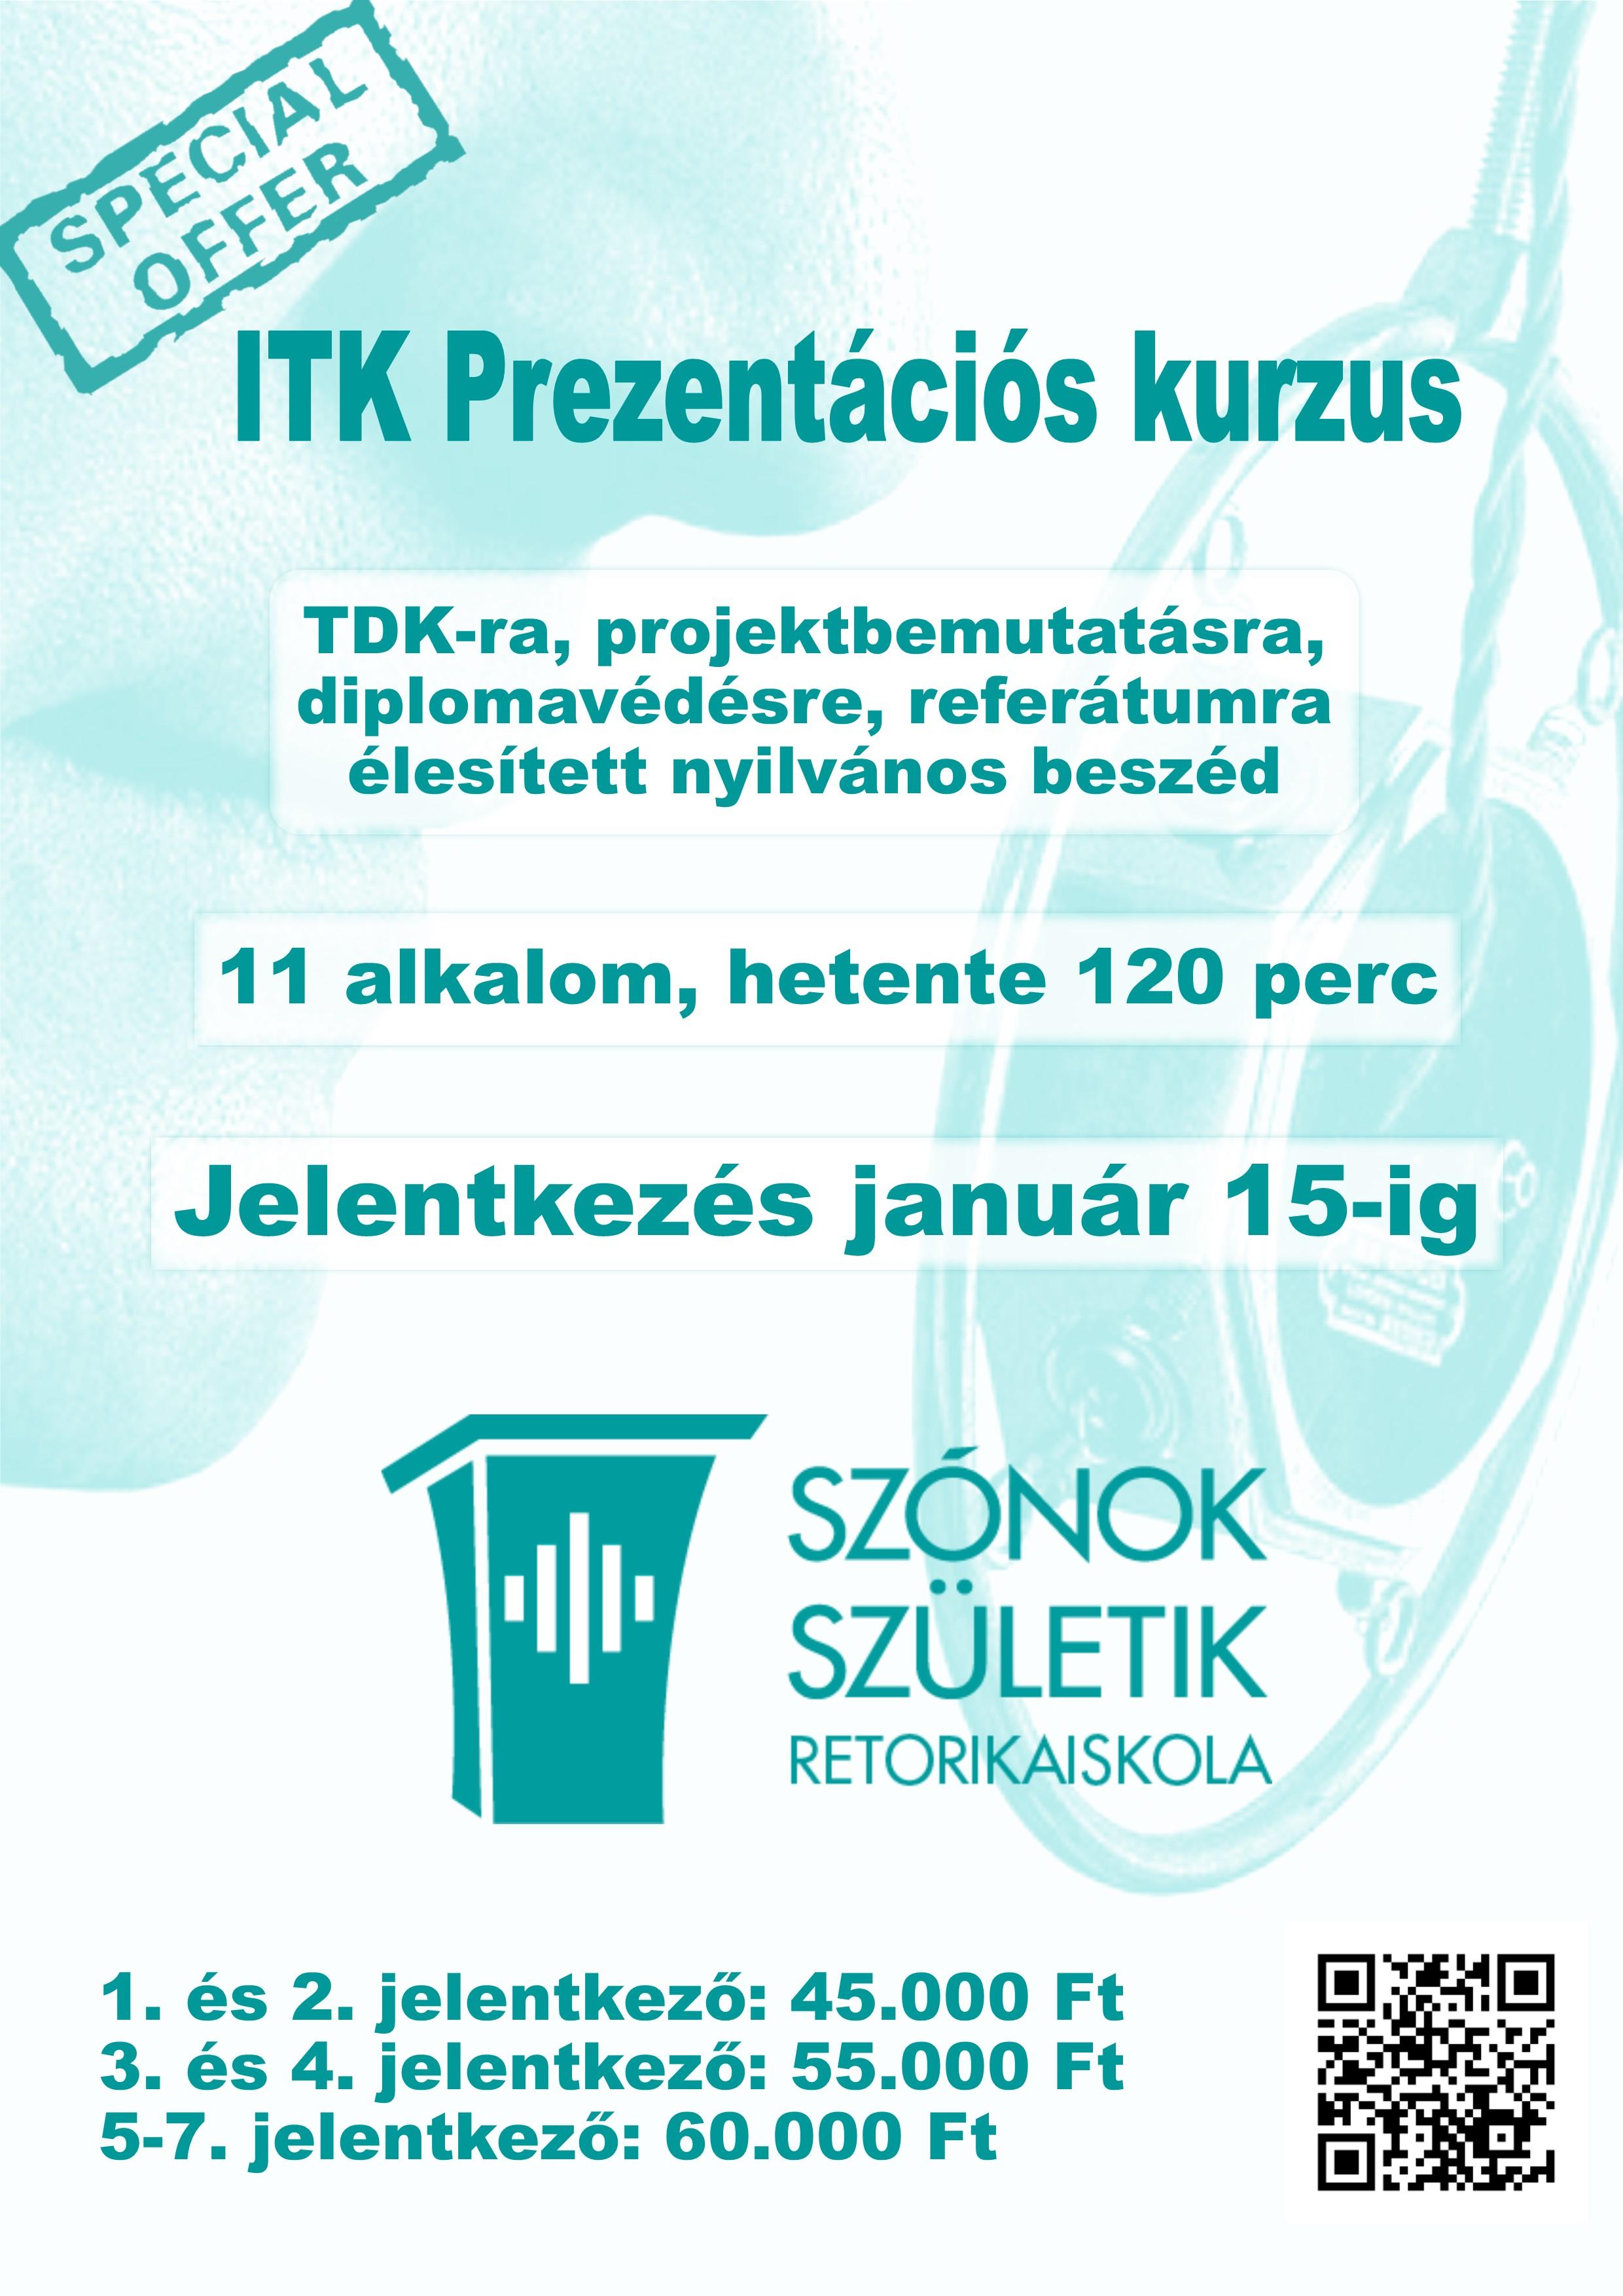 prezentacios_trening_itk_2017